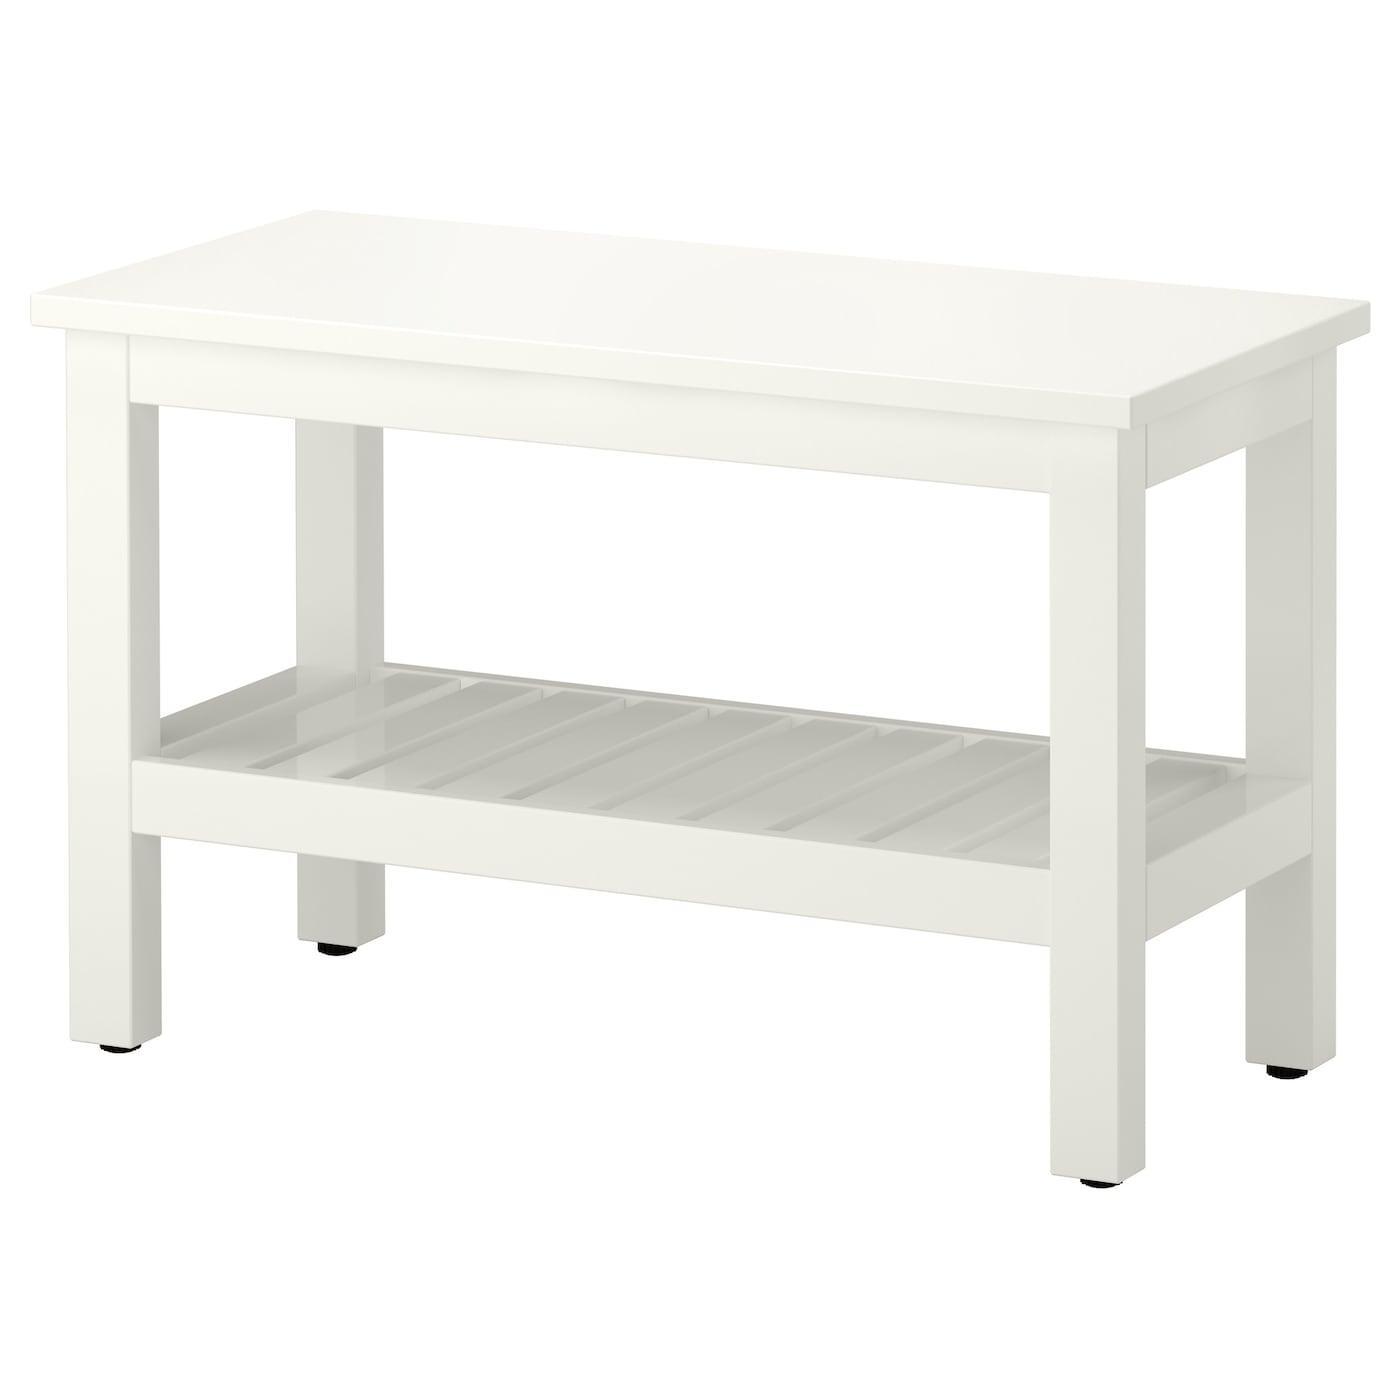 Hemnes banc blanc 83 cm ikea - Ikea suivi de commande ...